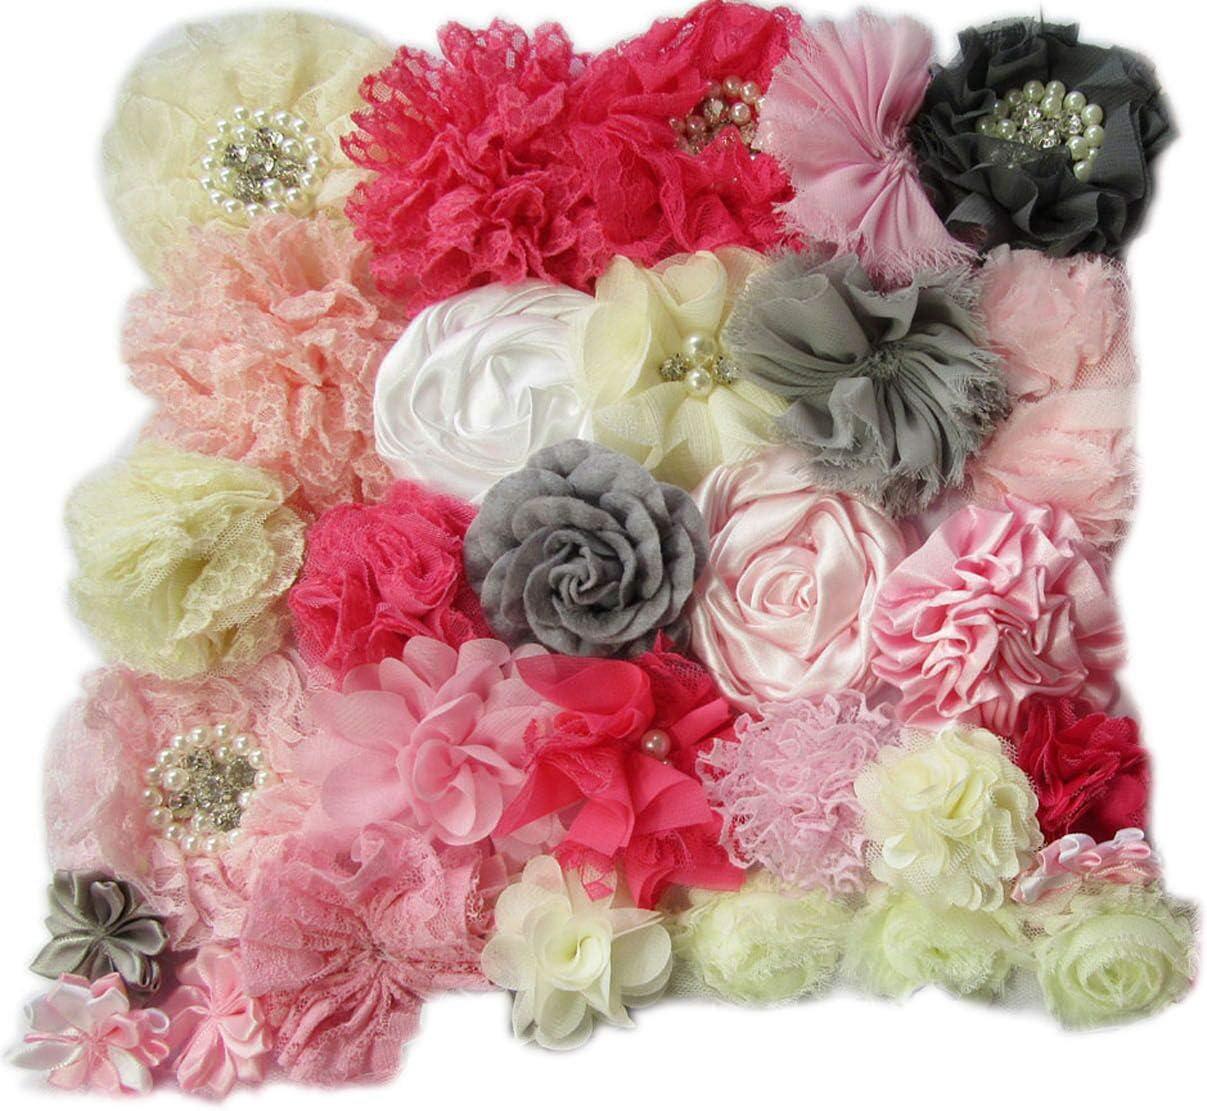 Shabby Lace Mesh Chiffon Craft Fabric Flowers For Baby Headband Hair DIY 30pcs